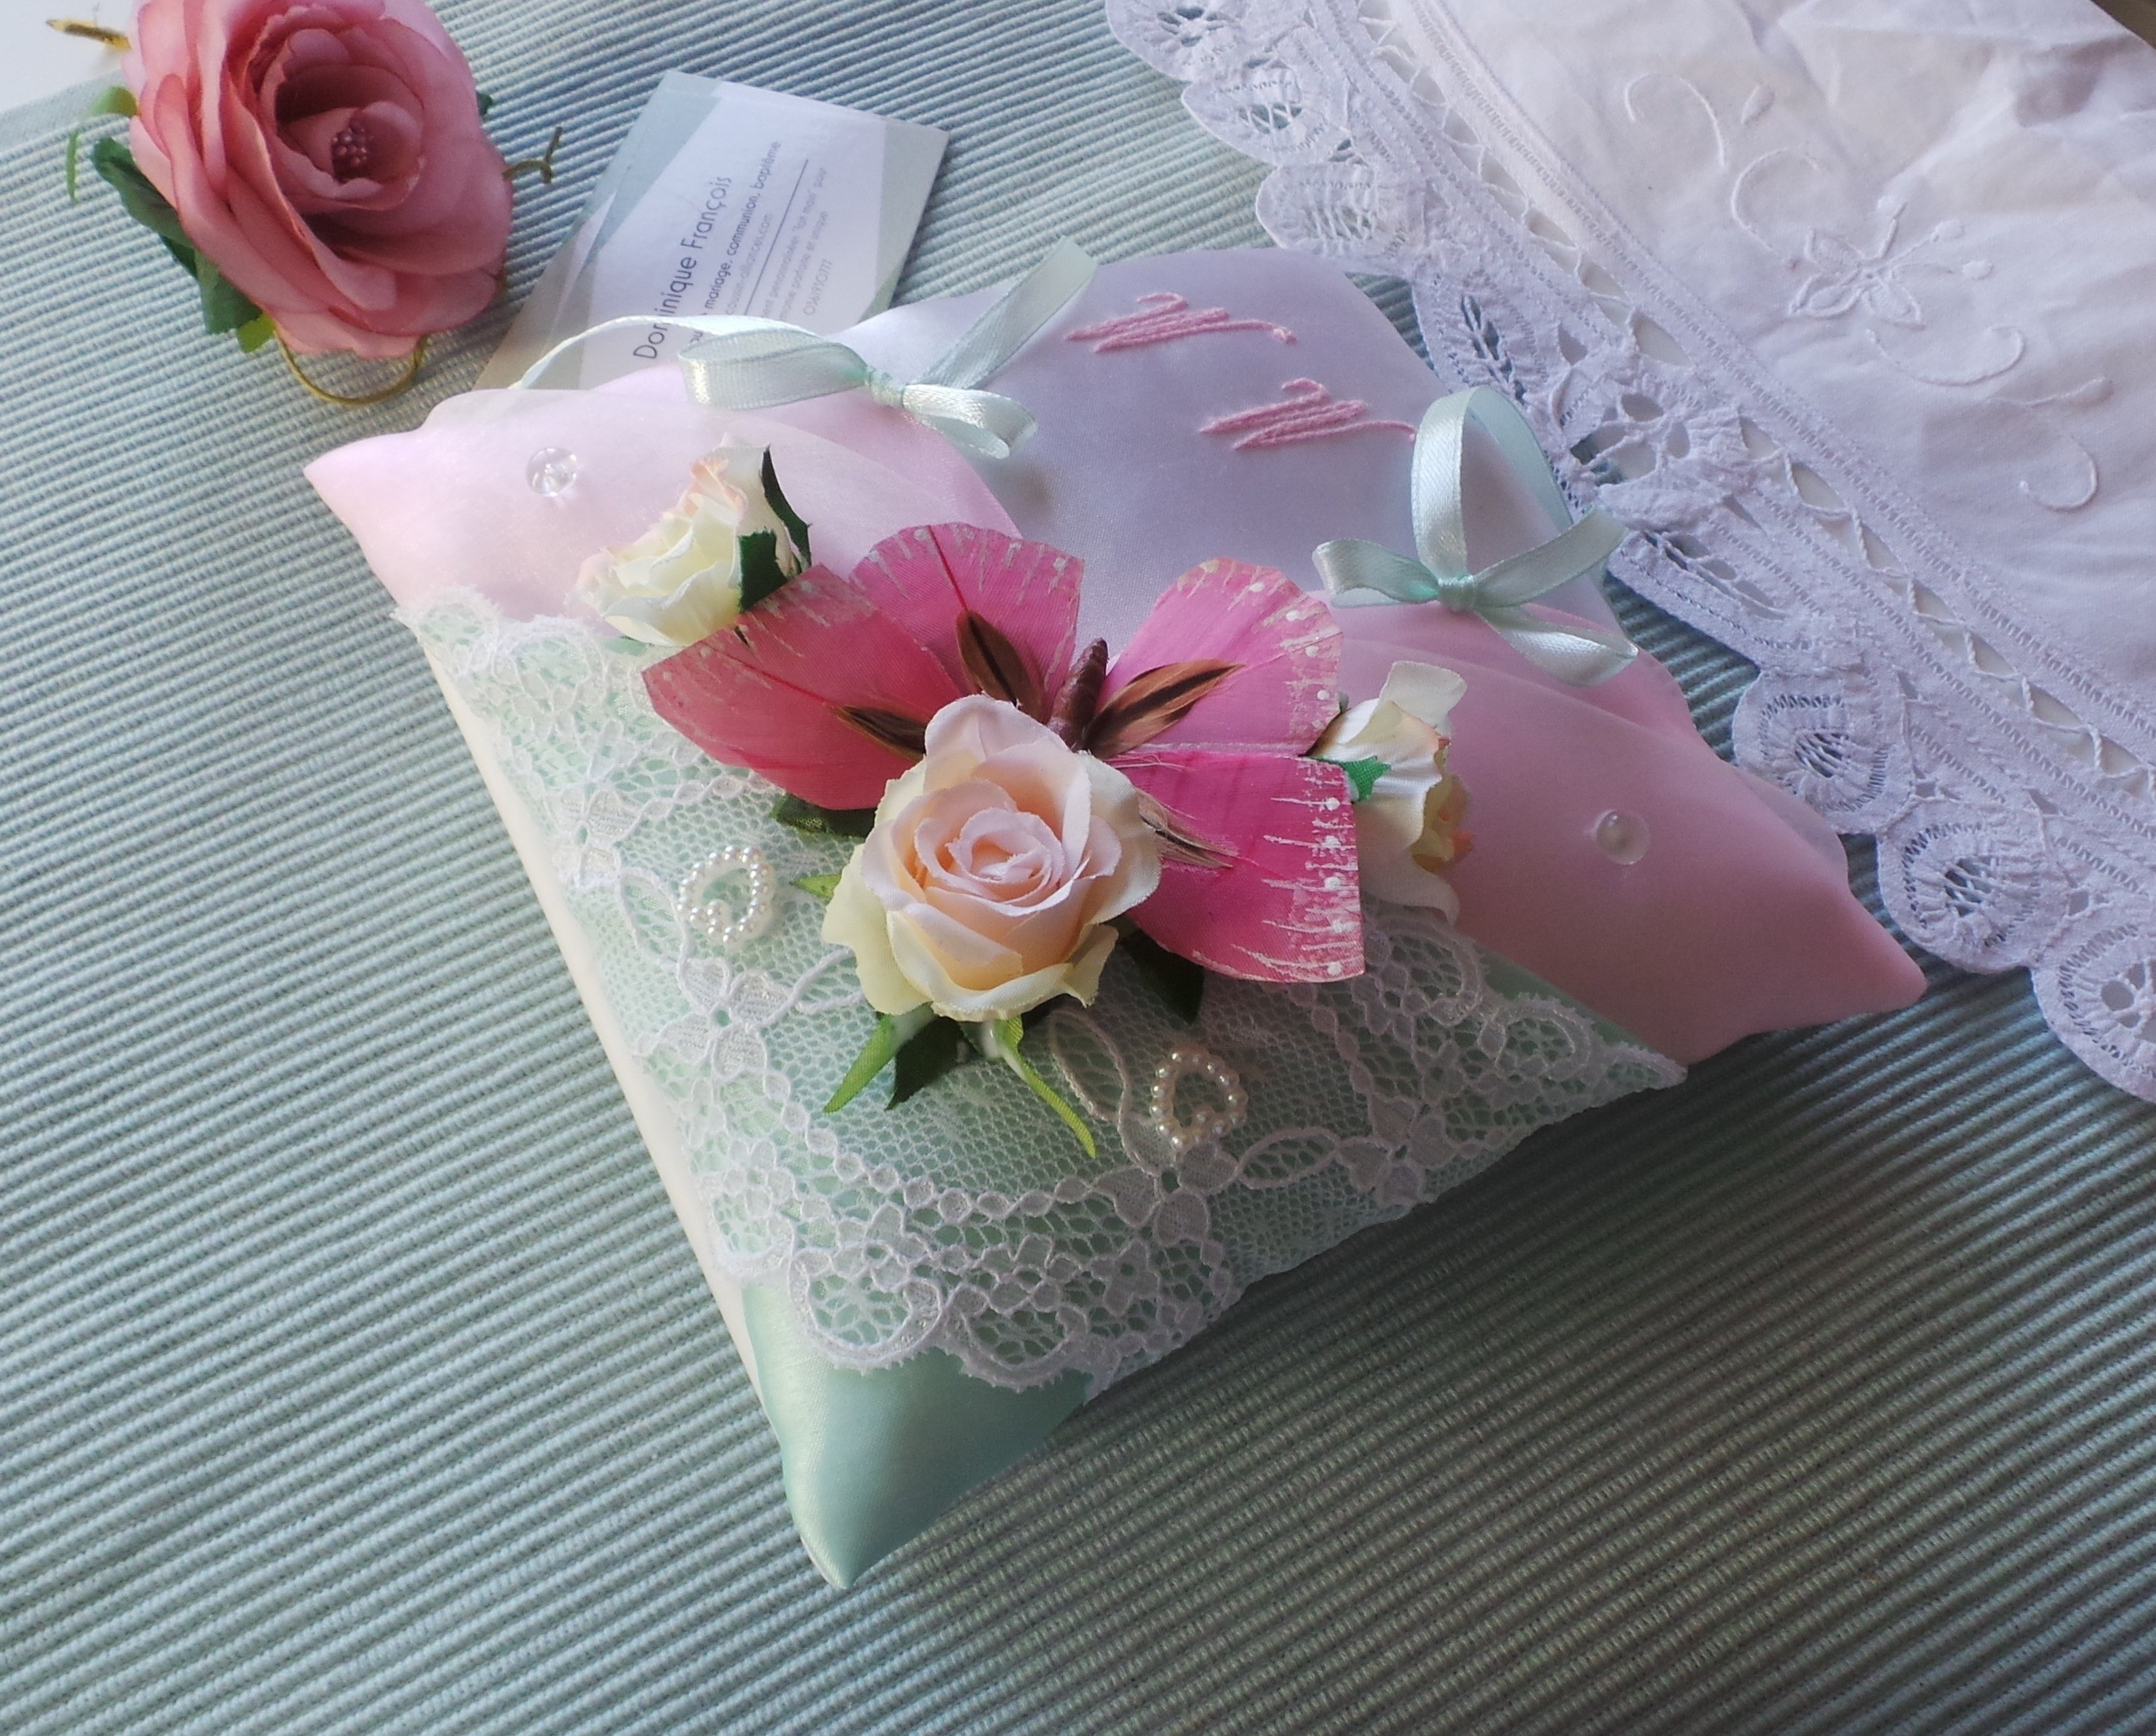 Coussin alliance personnalise champetre chic boheme vert rose pastel